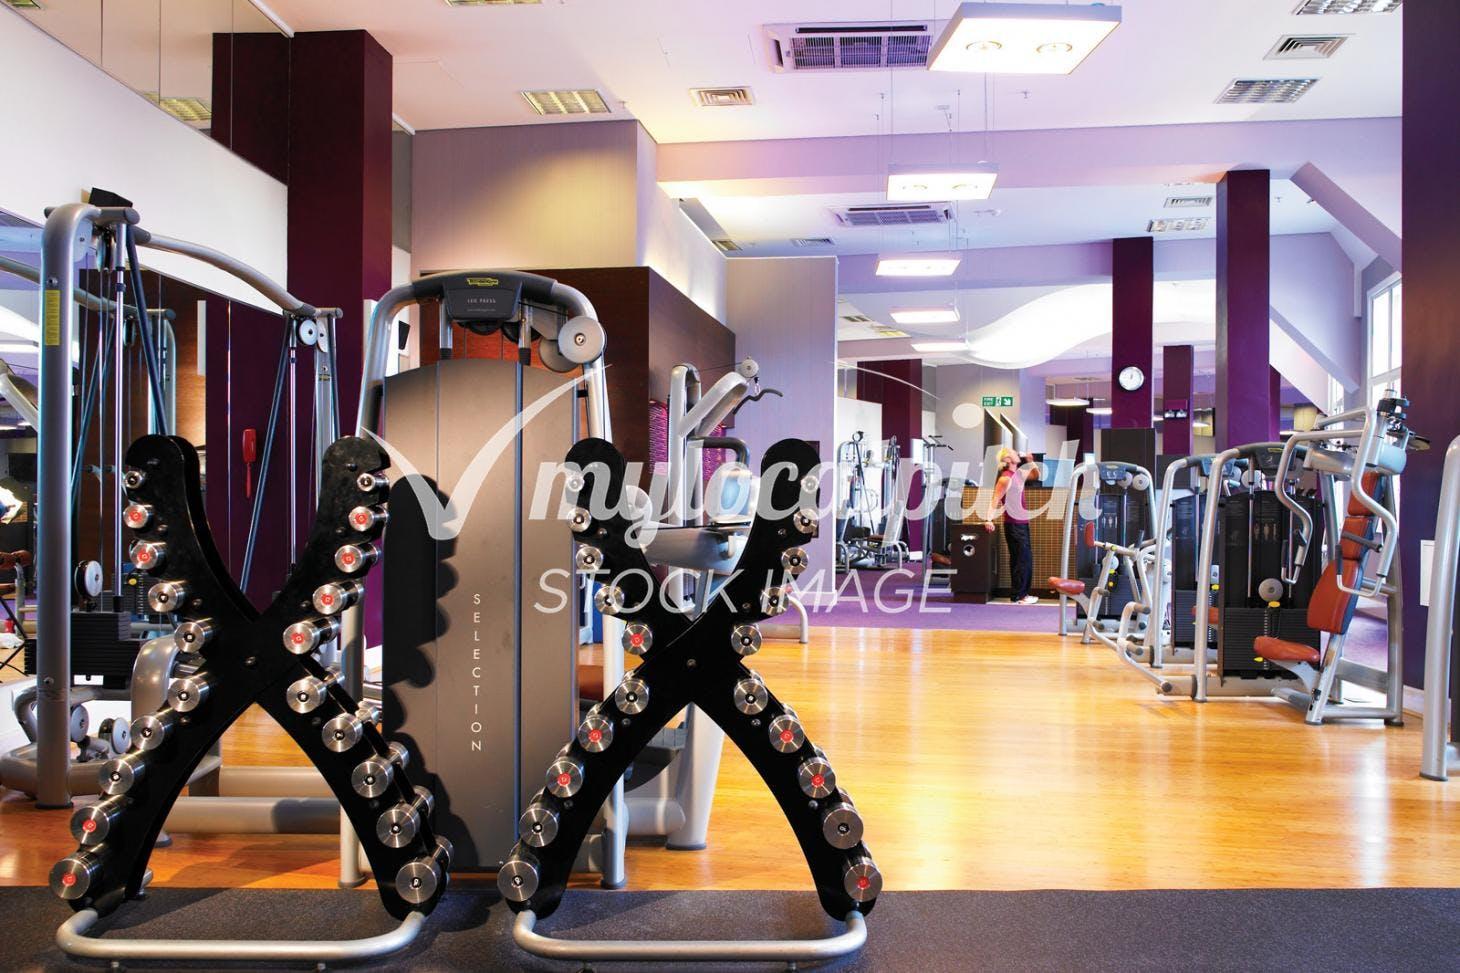 Charing Cross Sports Club Gym gym